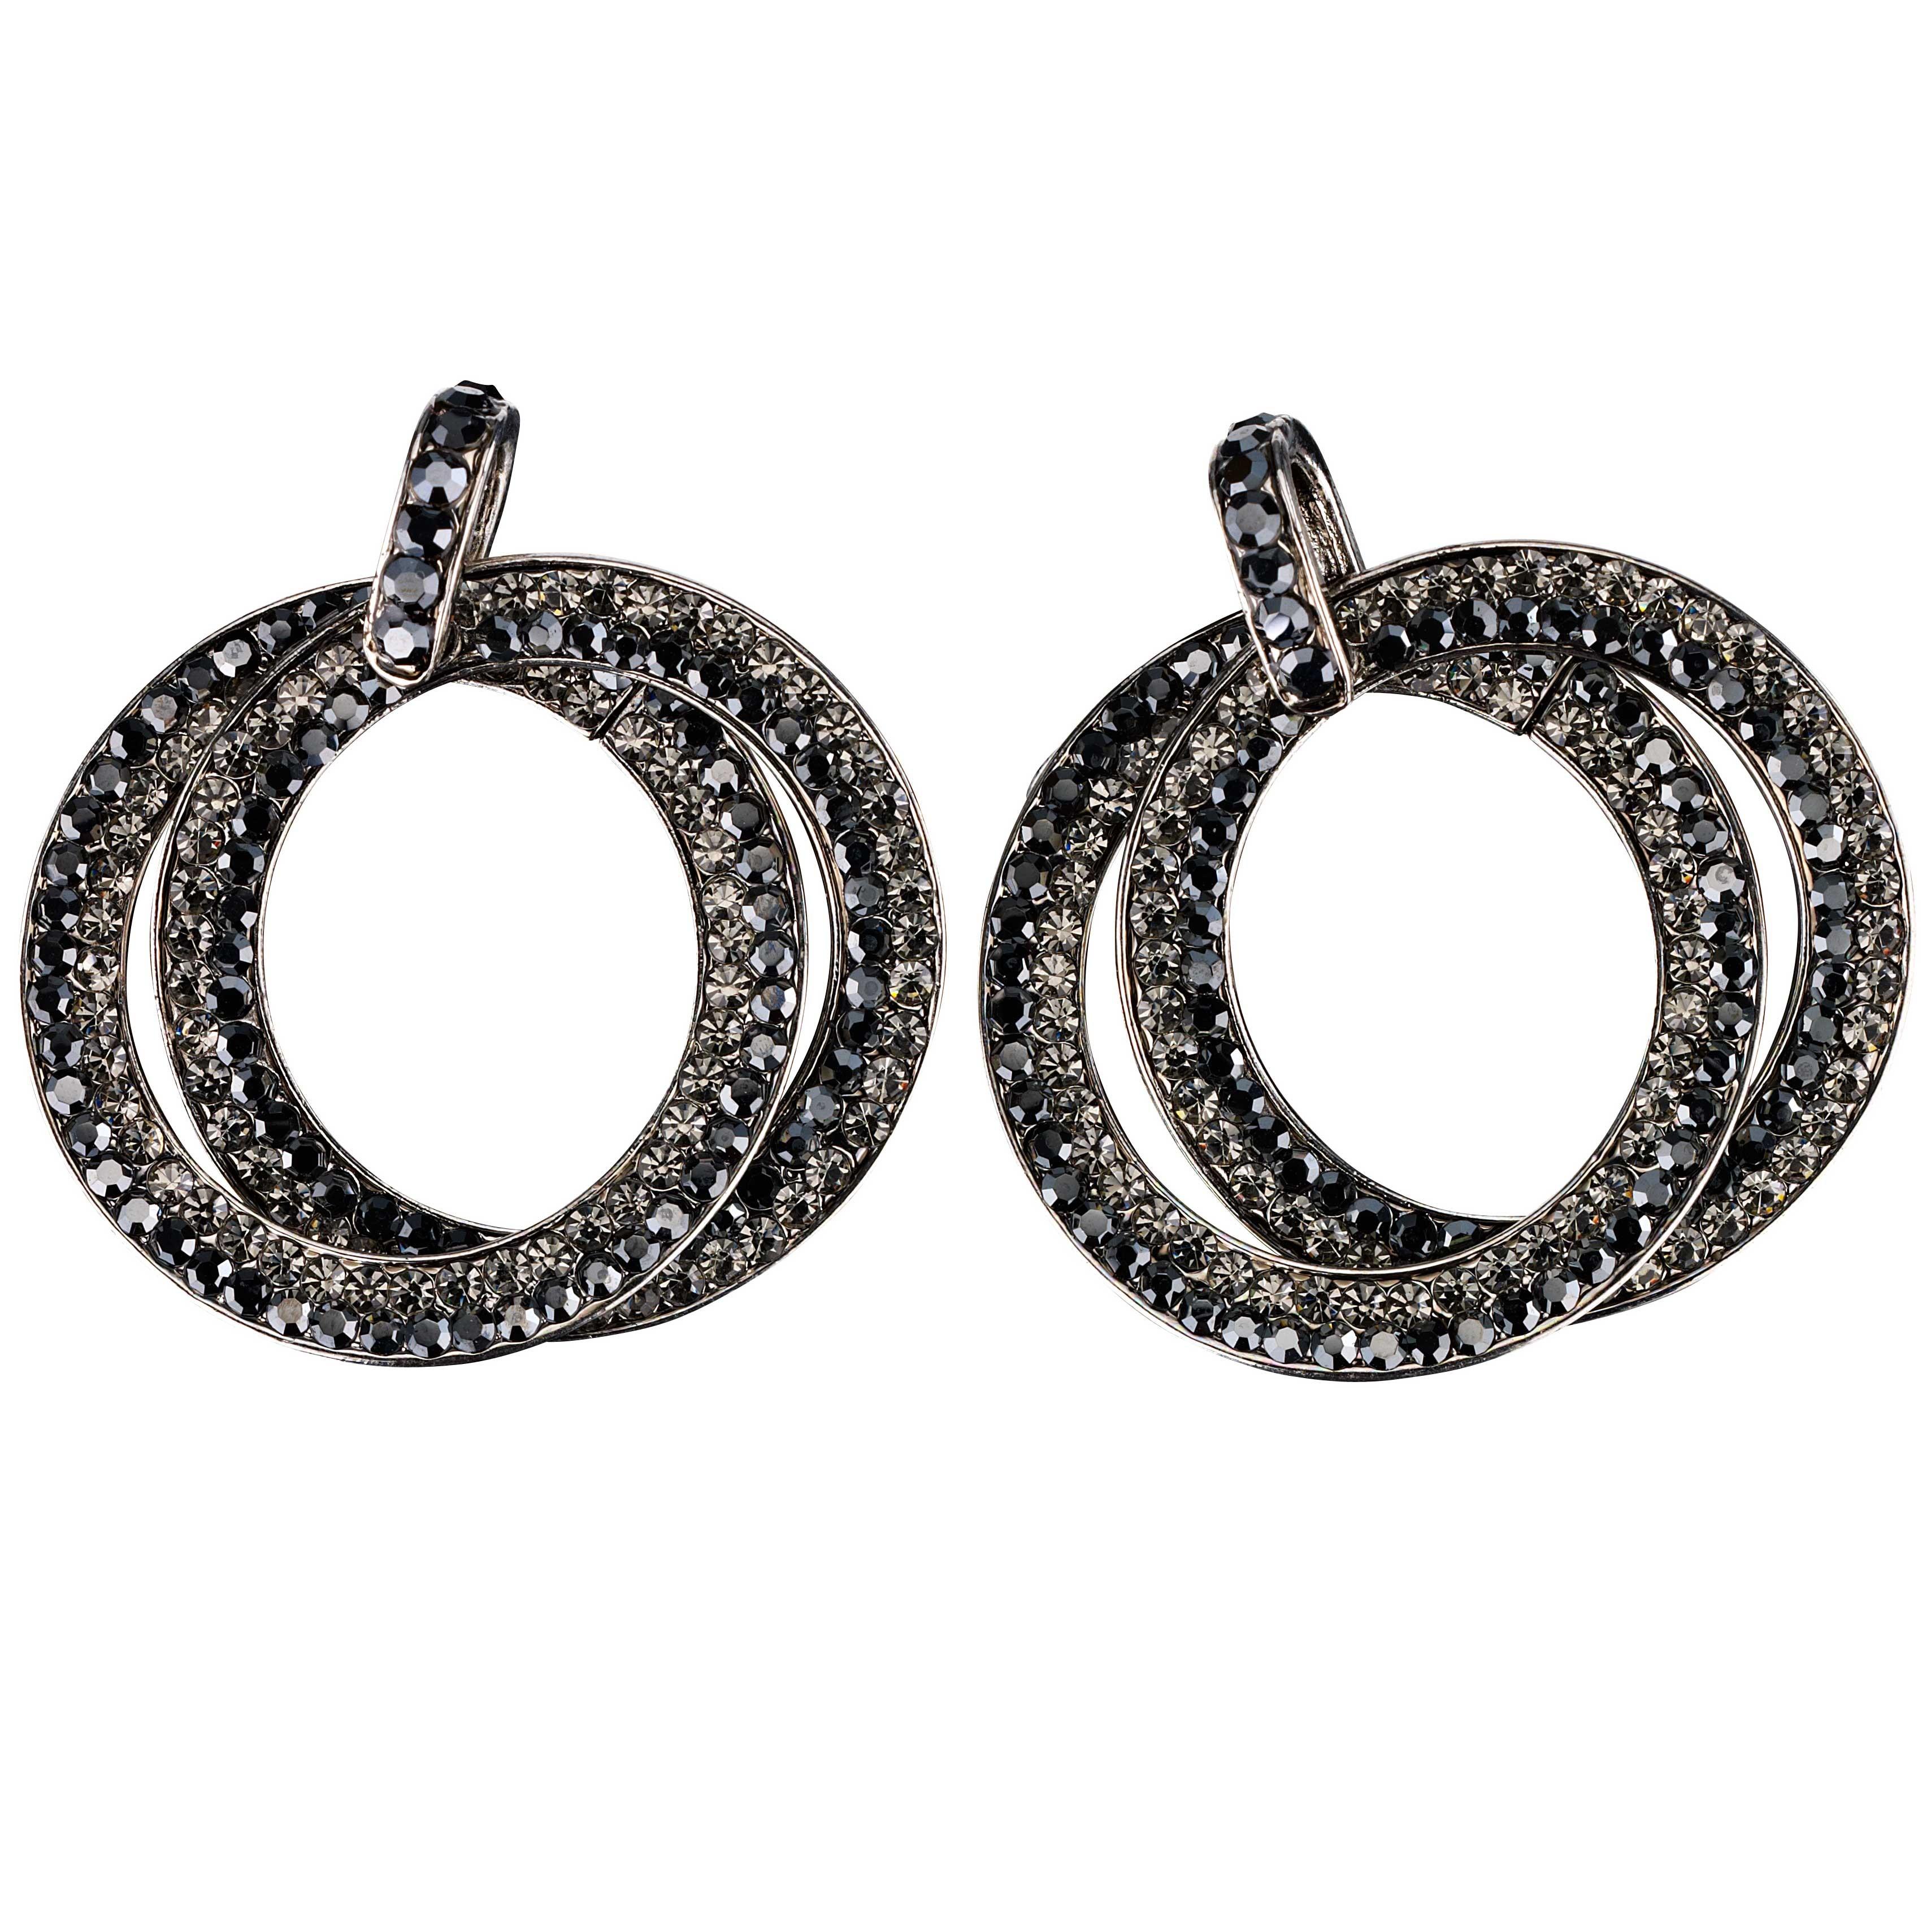 Swarovski Crystal Black Friday Deal Double Circle Hoops Crystal Earrings Jet Black And Black Diamond Swarovski Crystal Necklaces Earrings